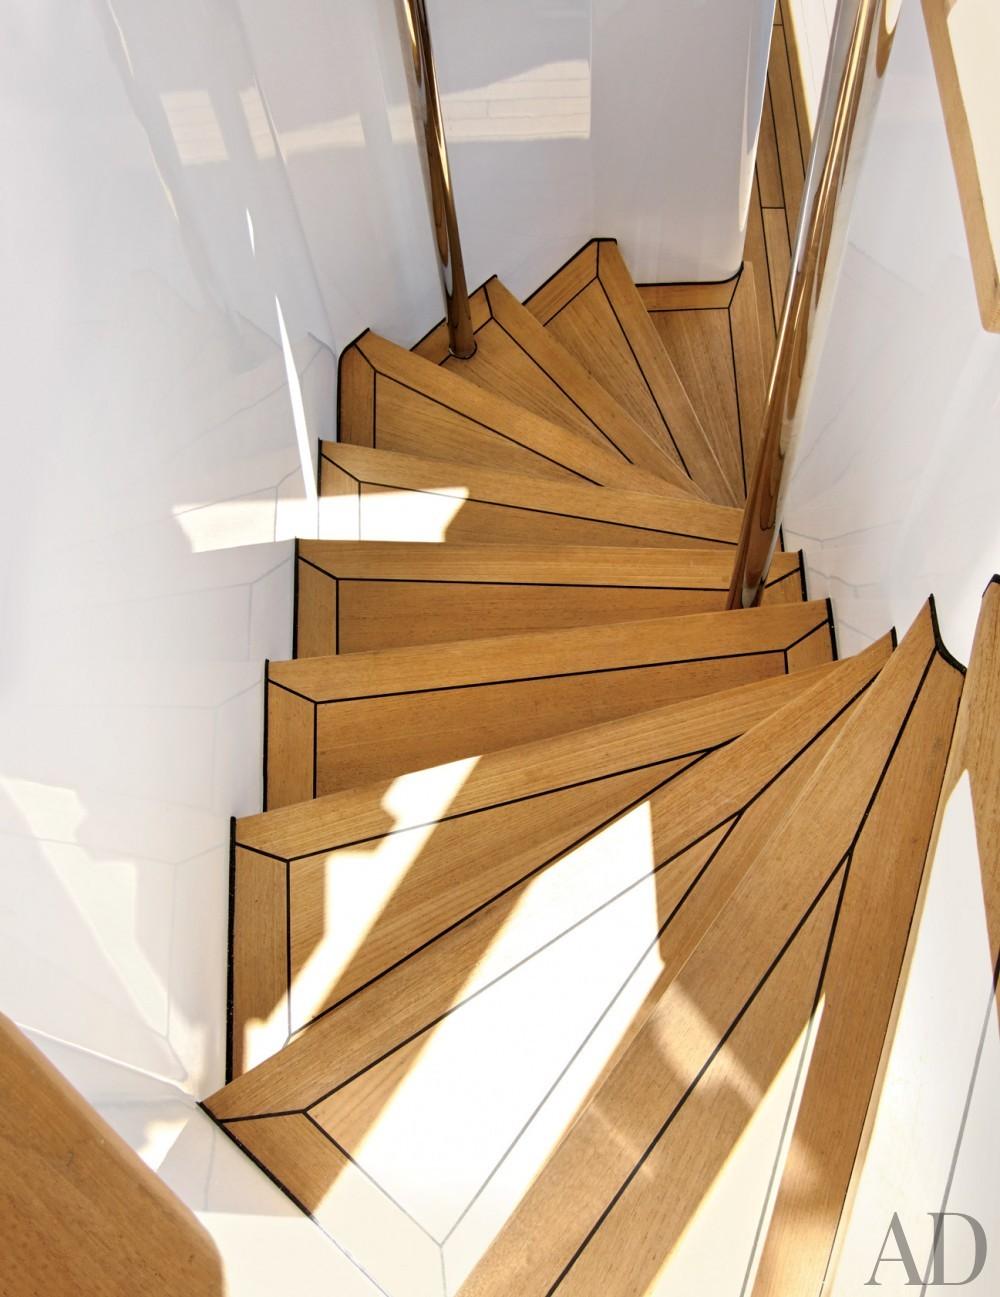 Modern Staircase by Joanne de Guardiola and Jon Bannenberg